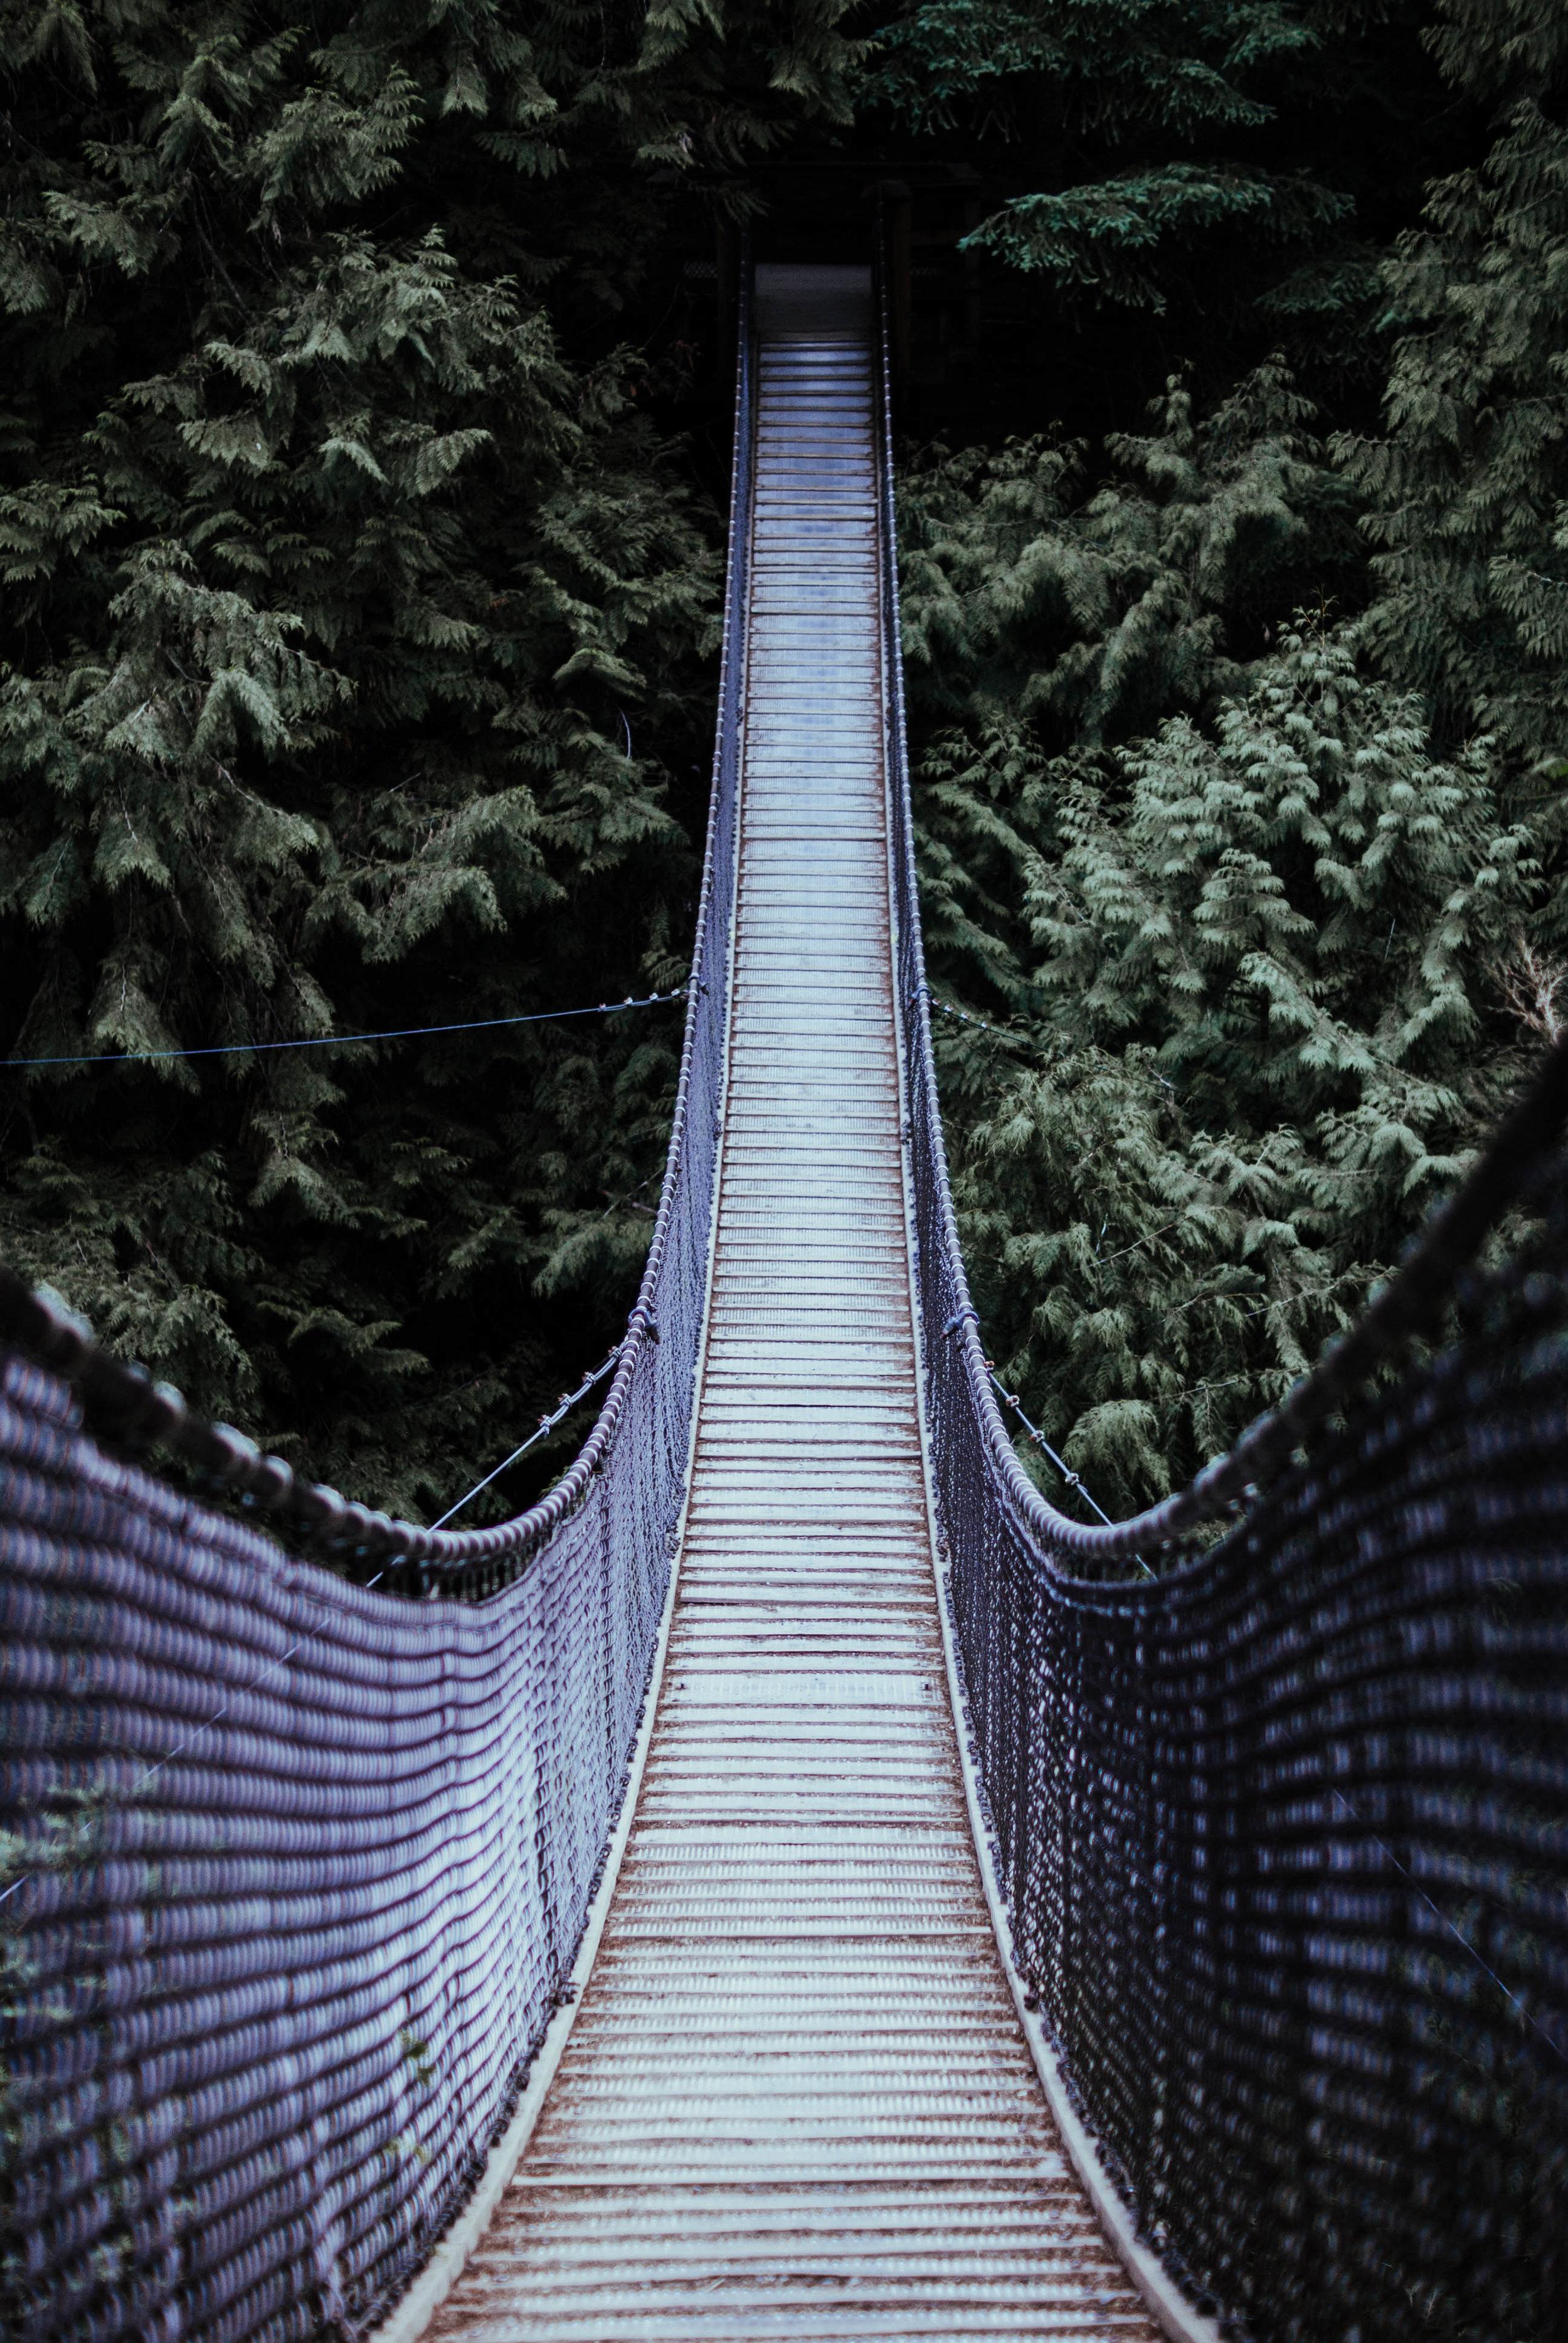 Location: Lynn Canyon Suspension Bridge, Vancouver, BC